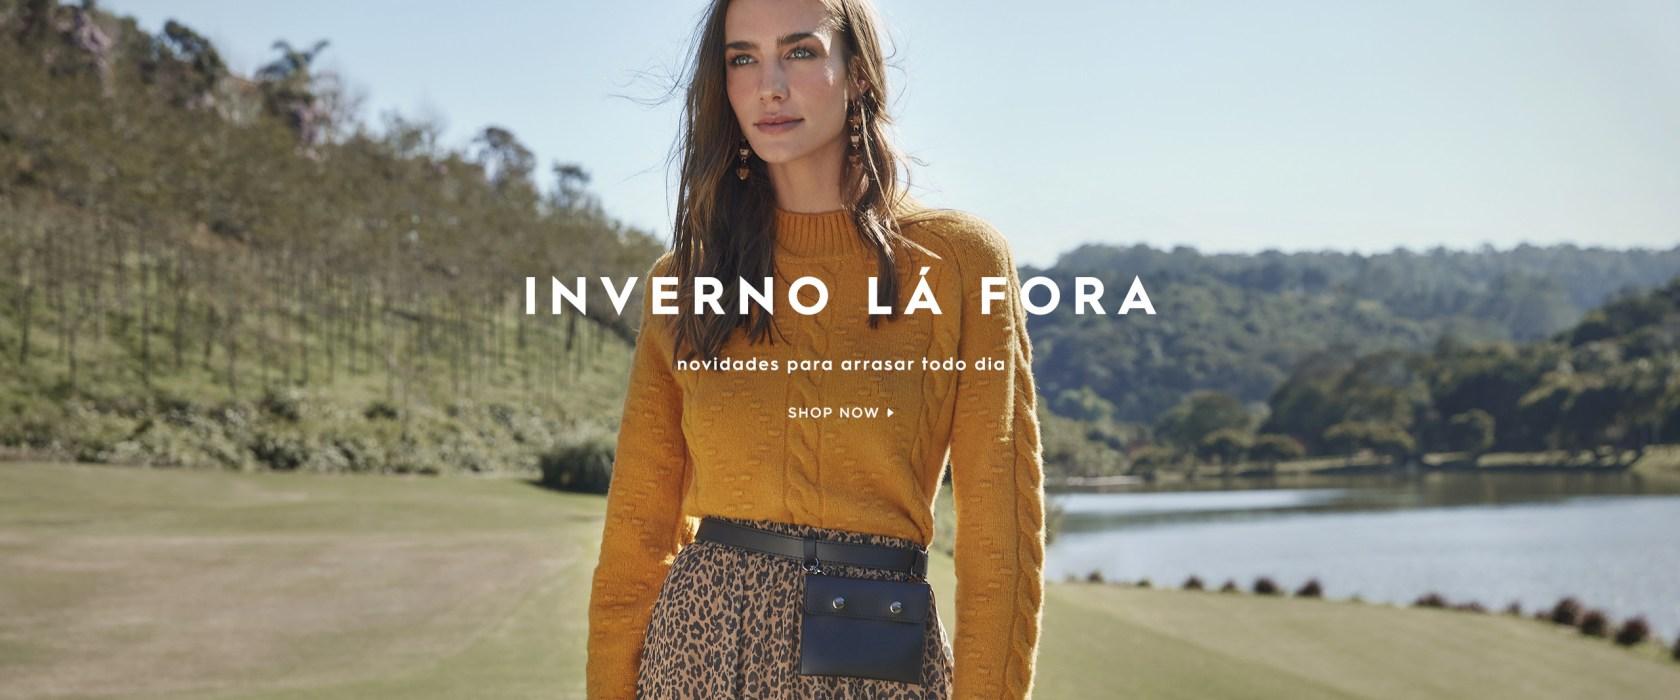 f6215cd1f Moda Feminina Online: Roupas, Sapatos e Acessórios | AMARO